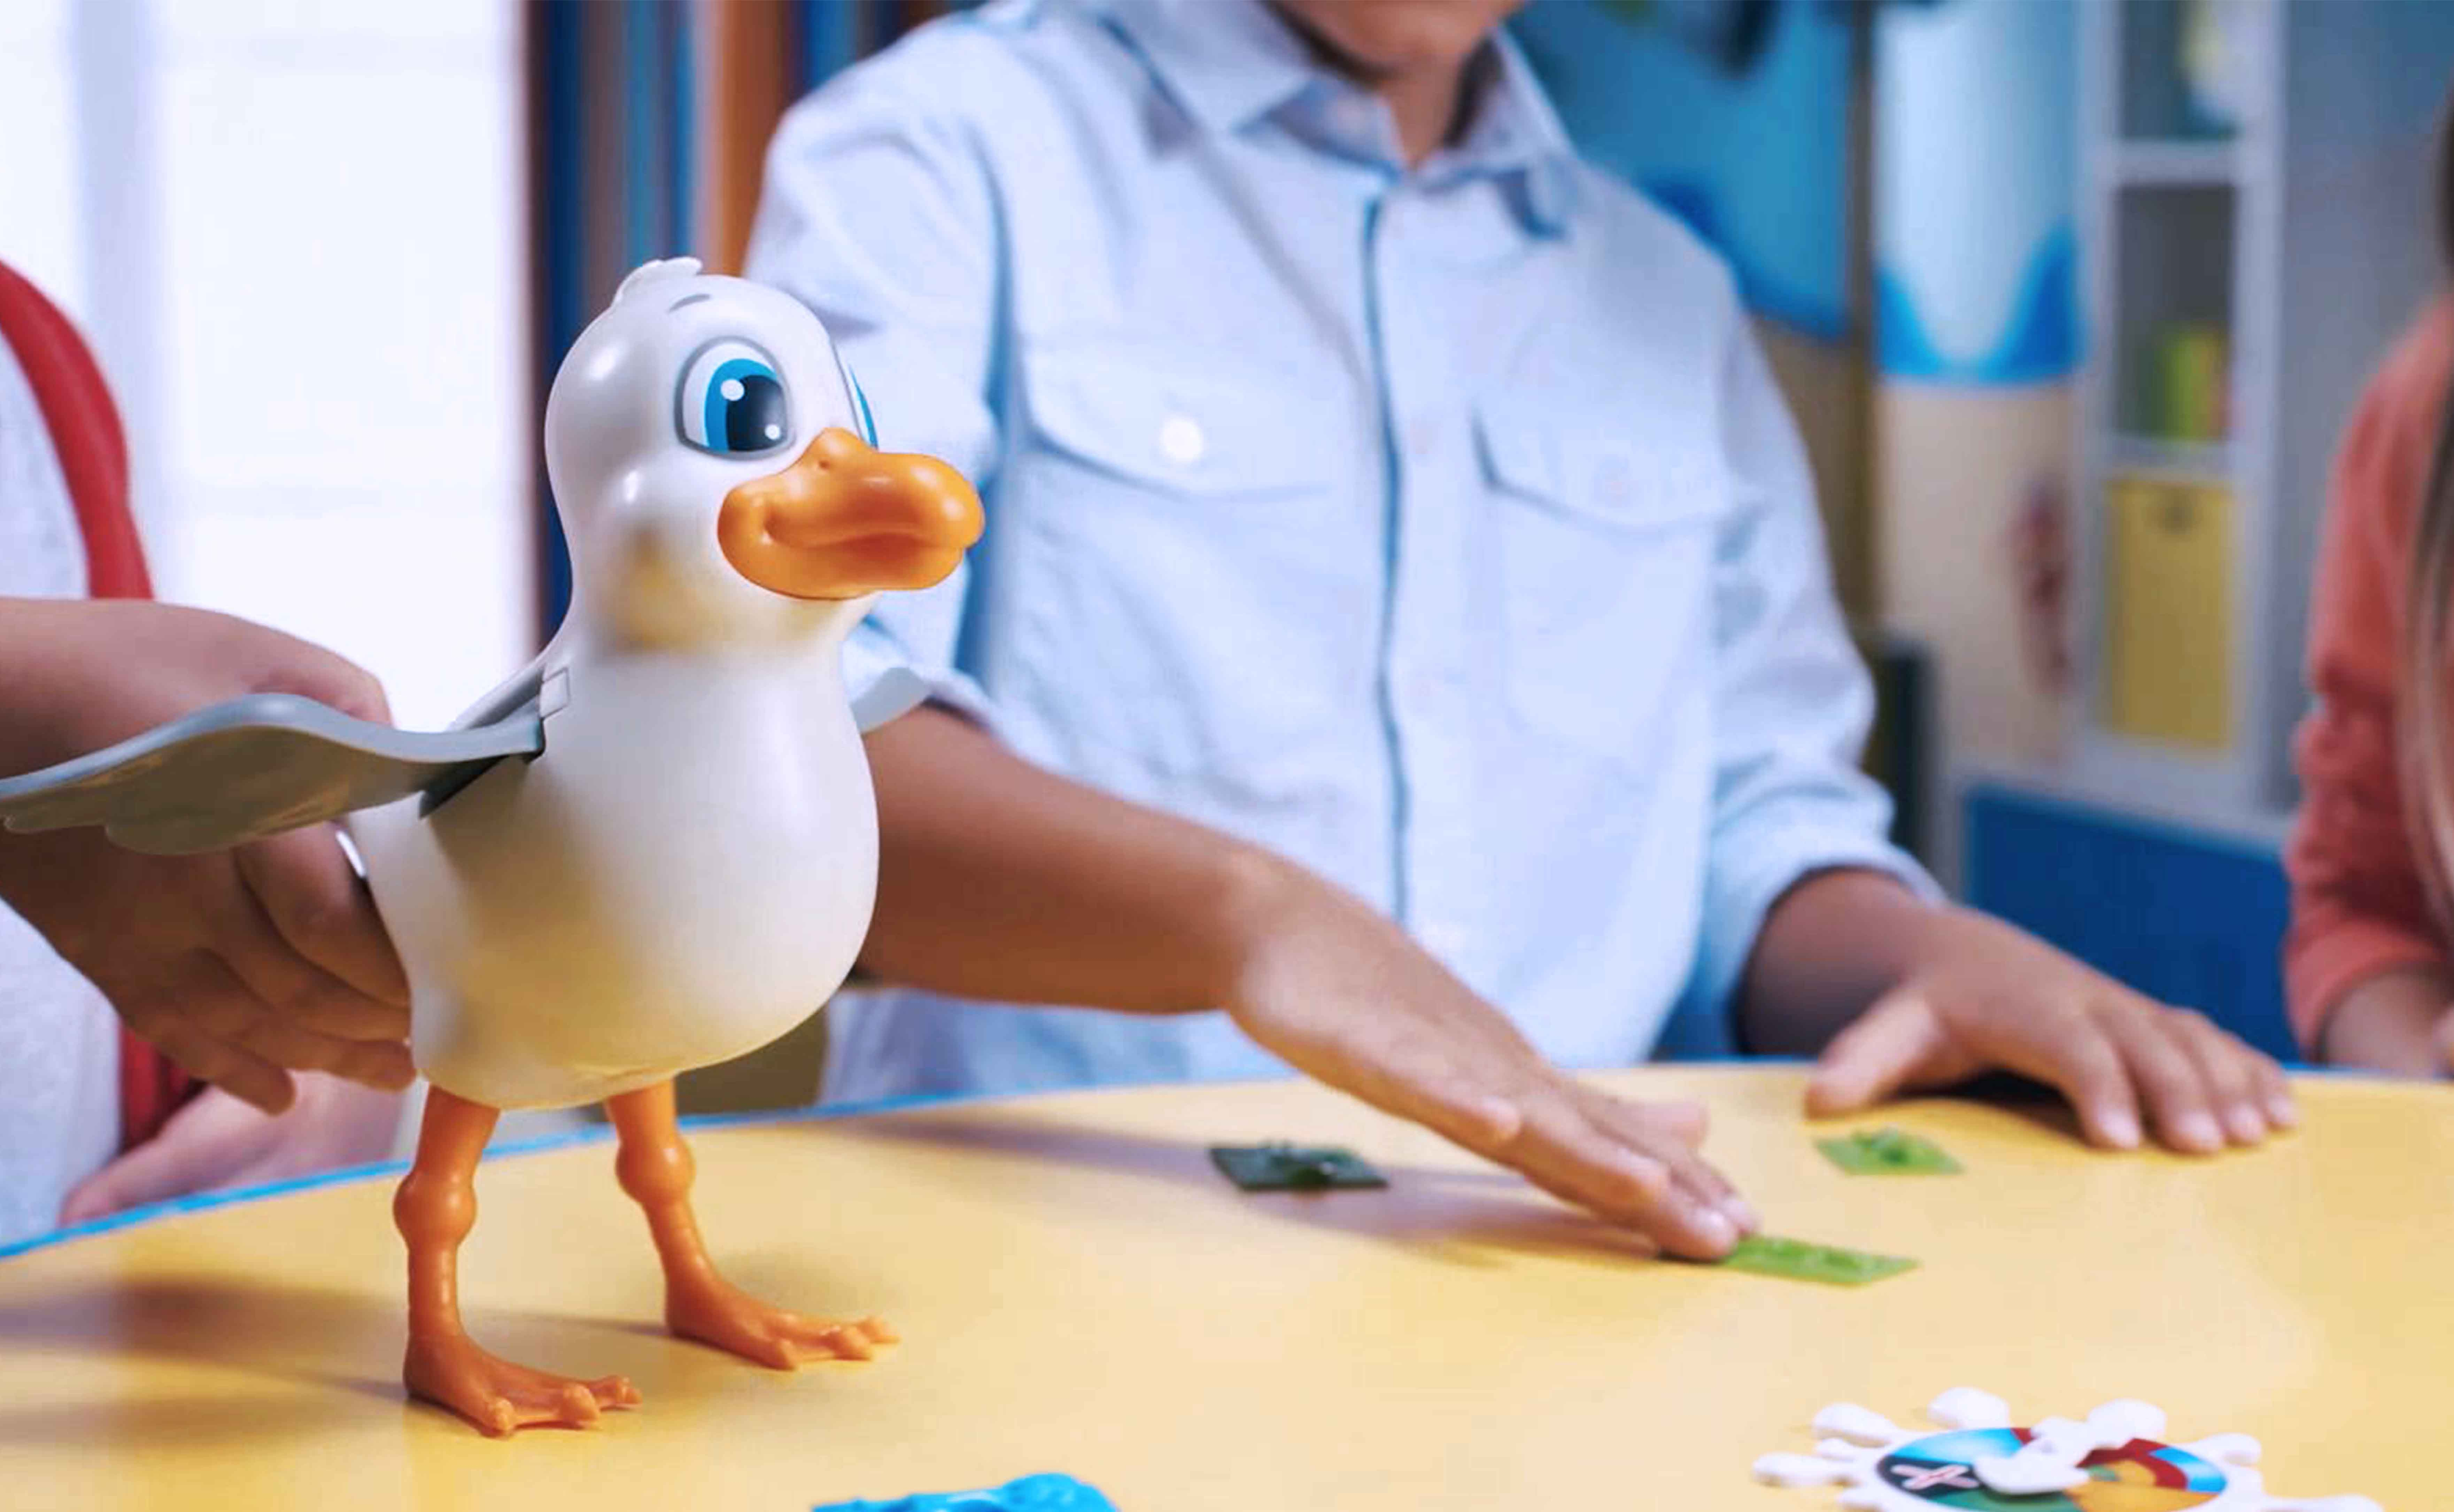 Seagull Splat